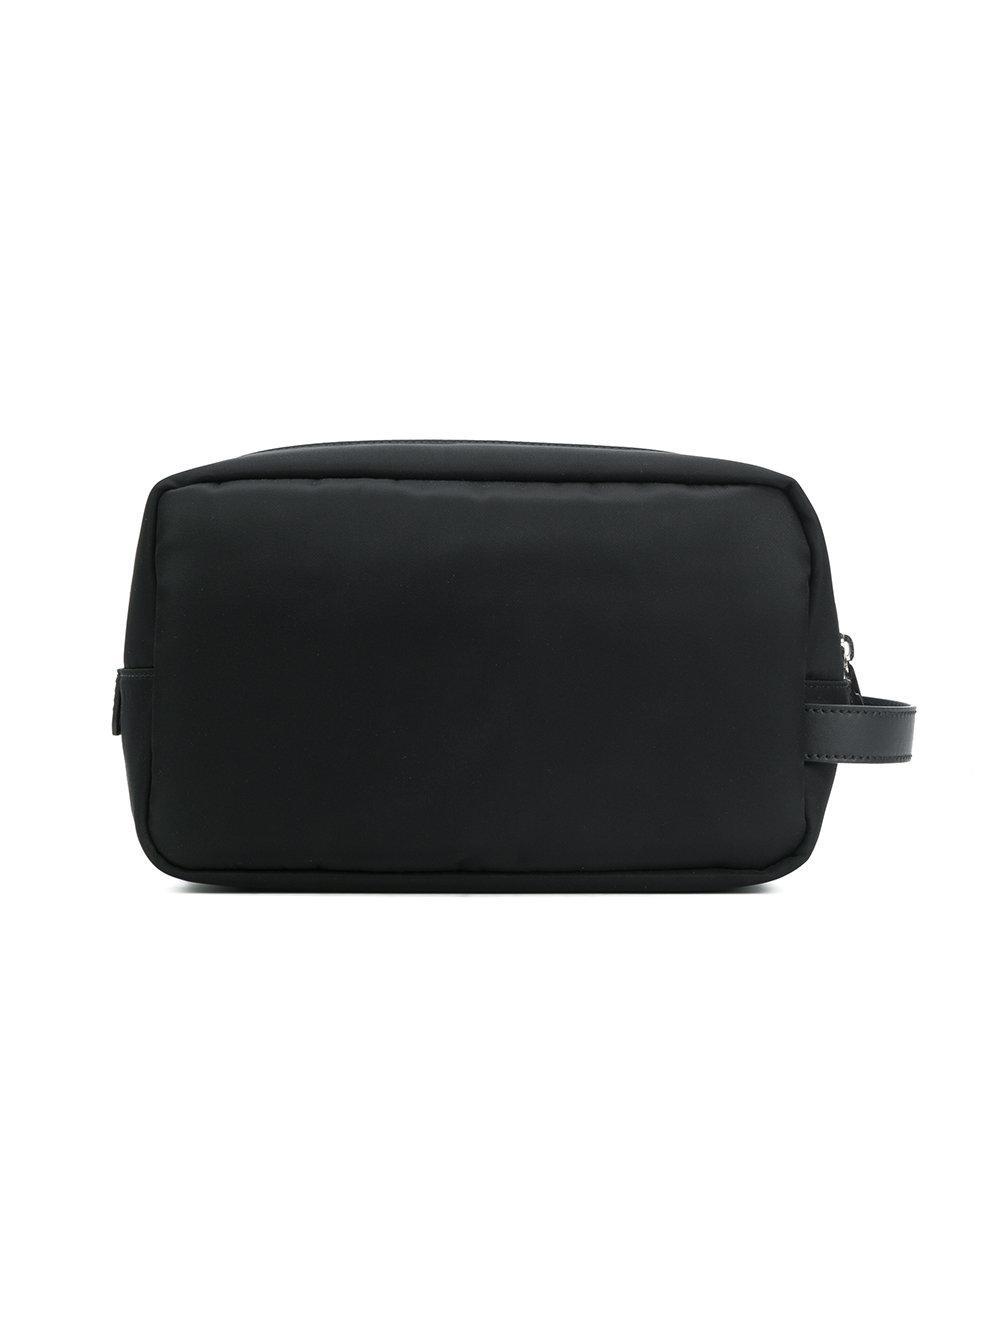 755d526ae724 Fendi Zipped Wash Bag in Black for Men - Lyst